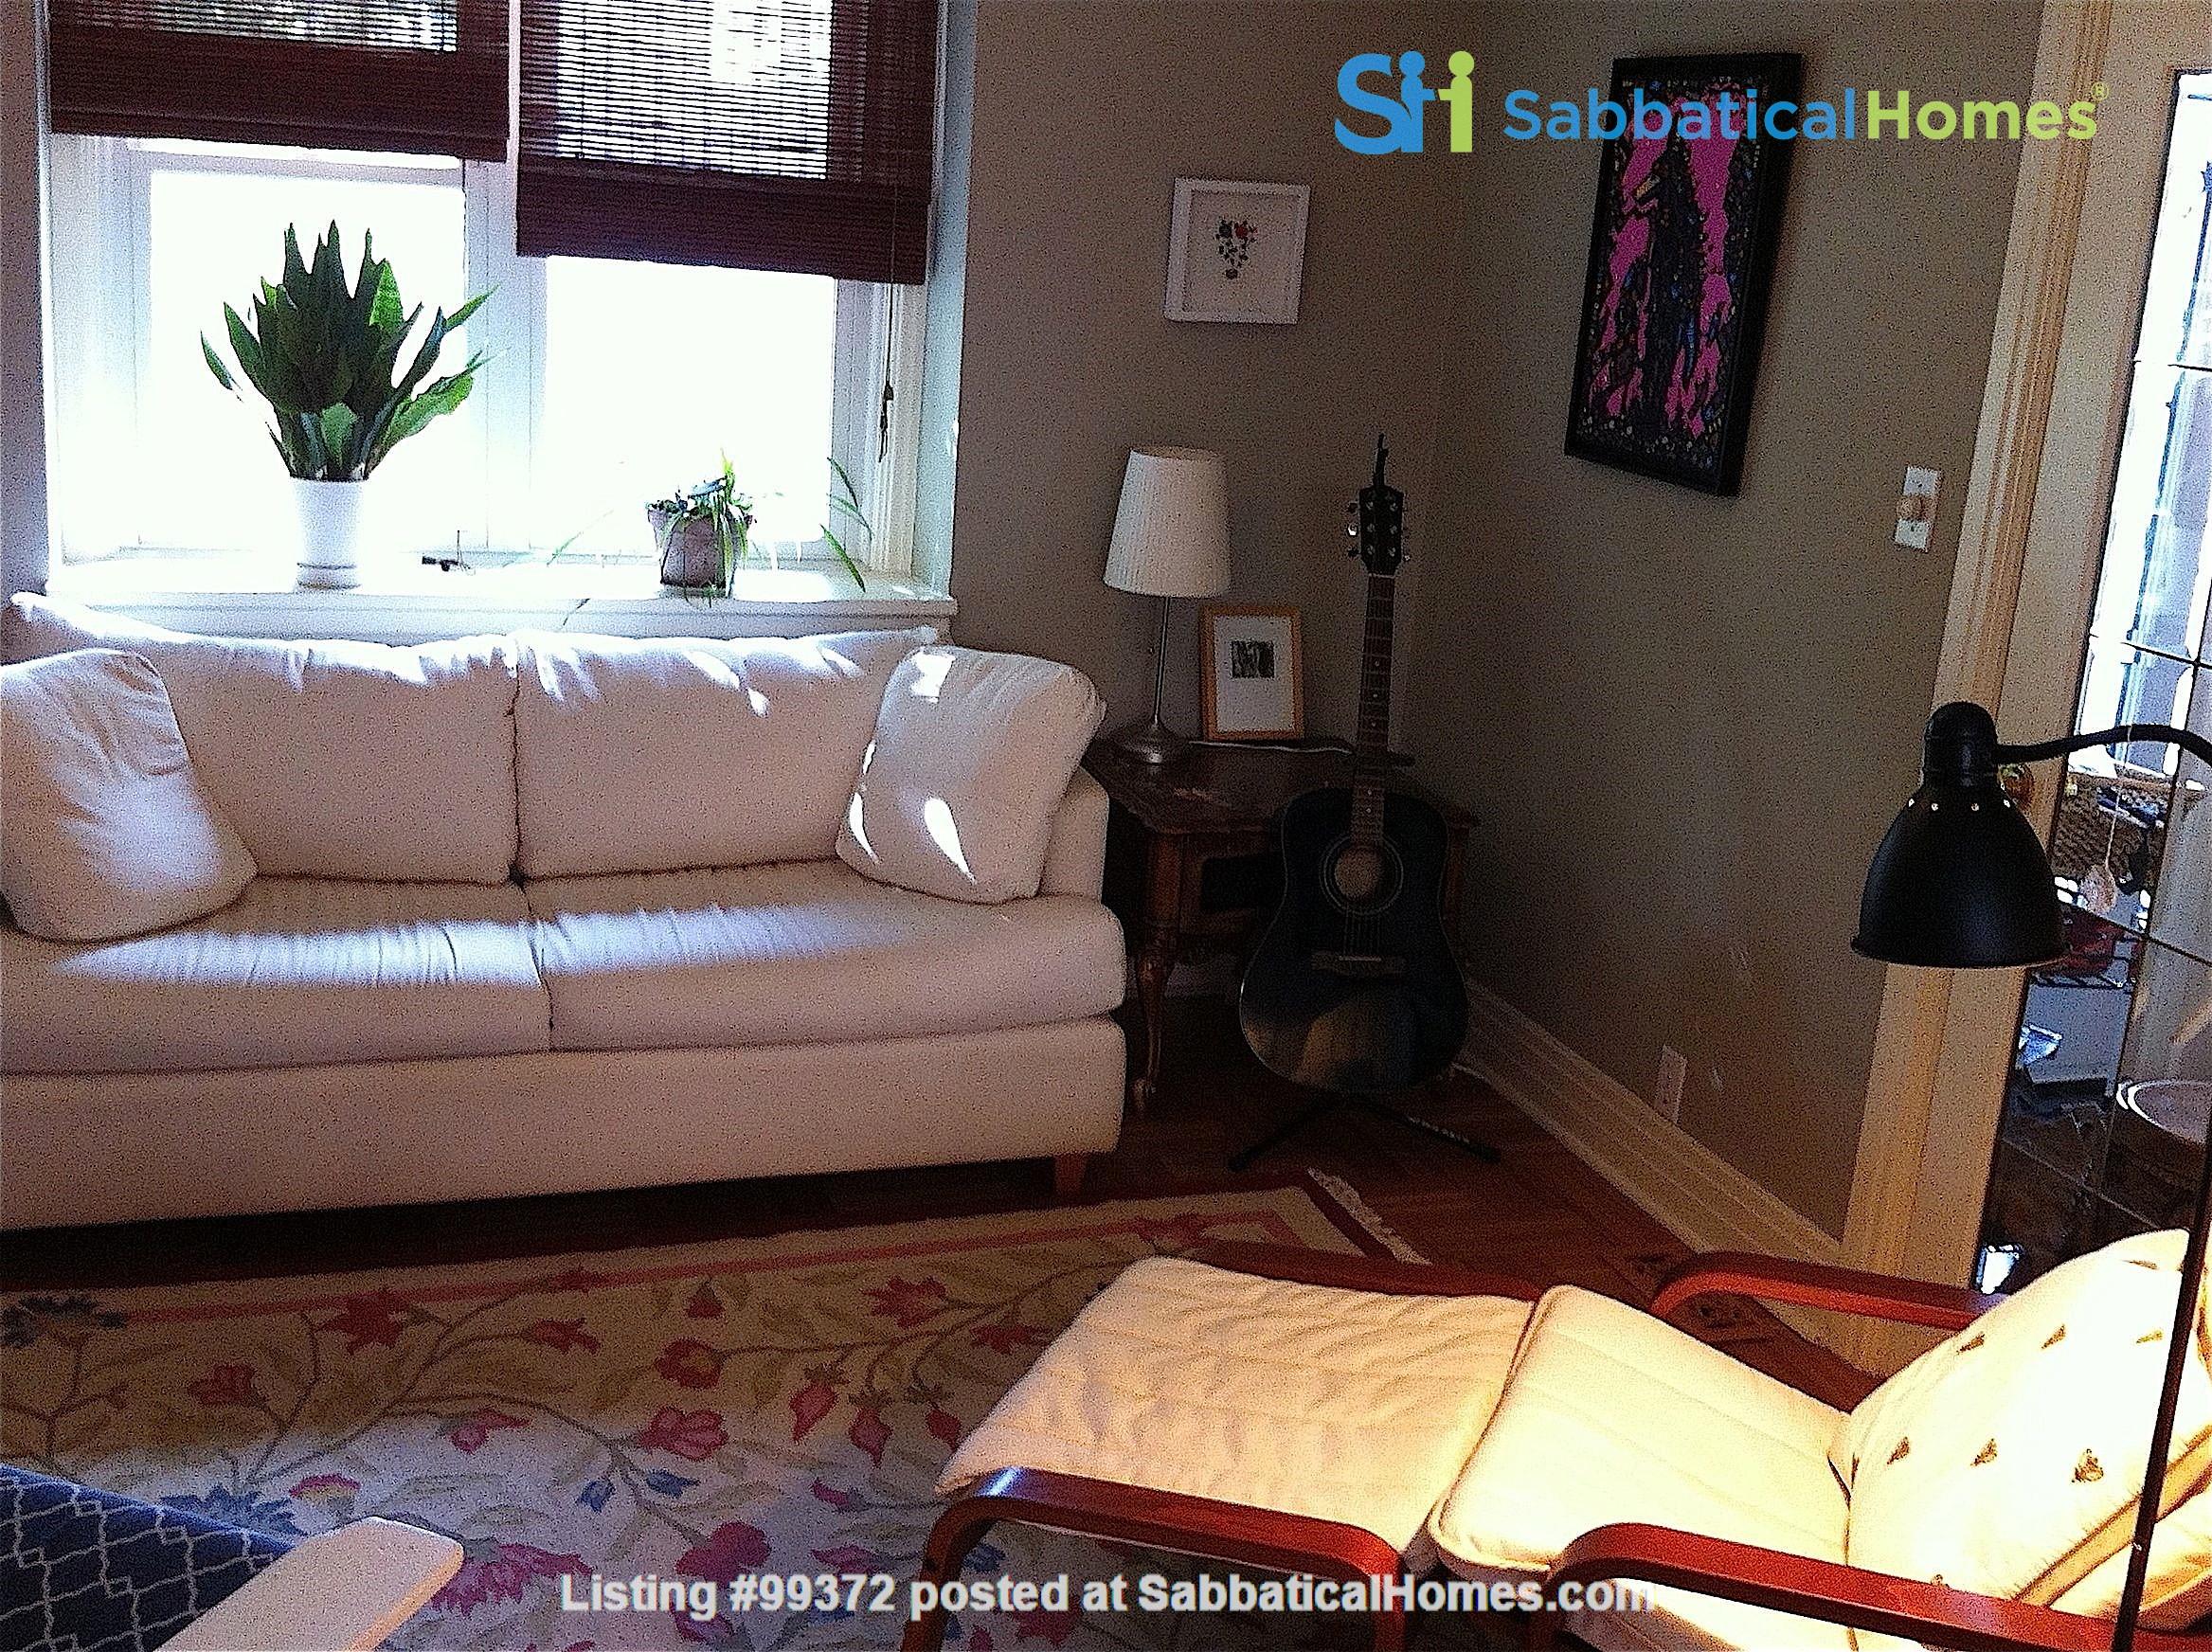 Lovely 2BR + Den House in Vibrant Corso Italia Home Rental in Toronto 4